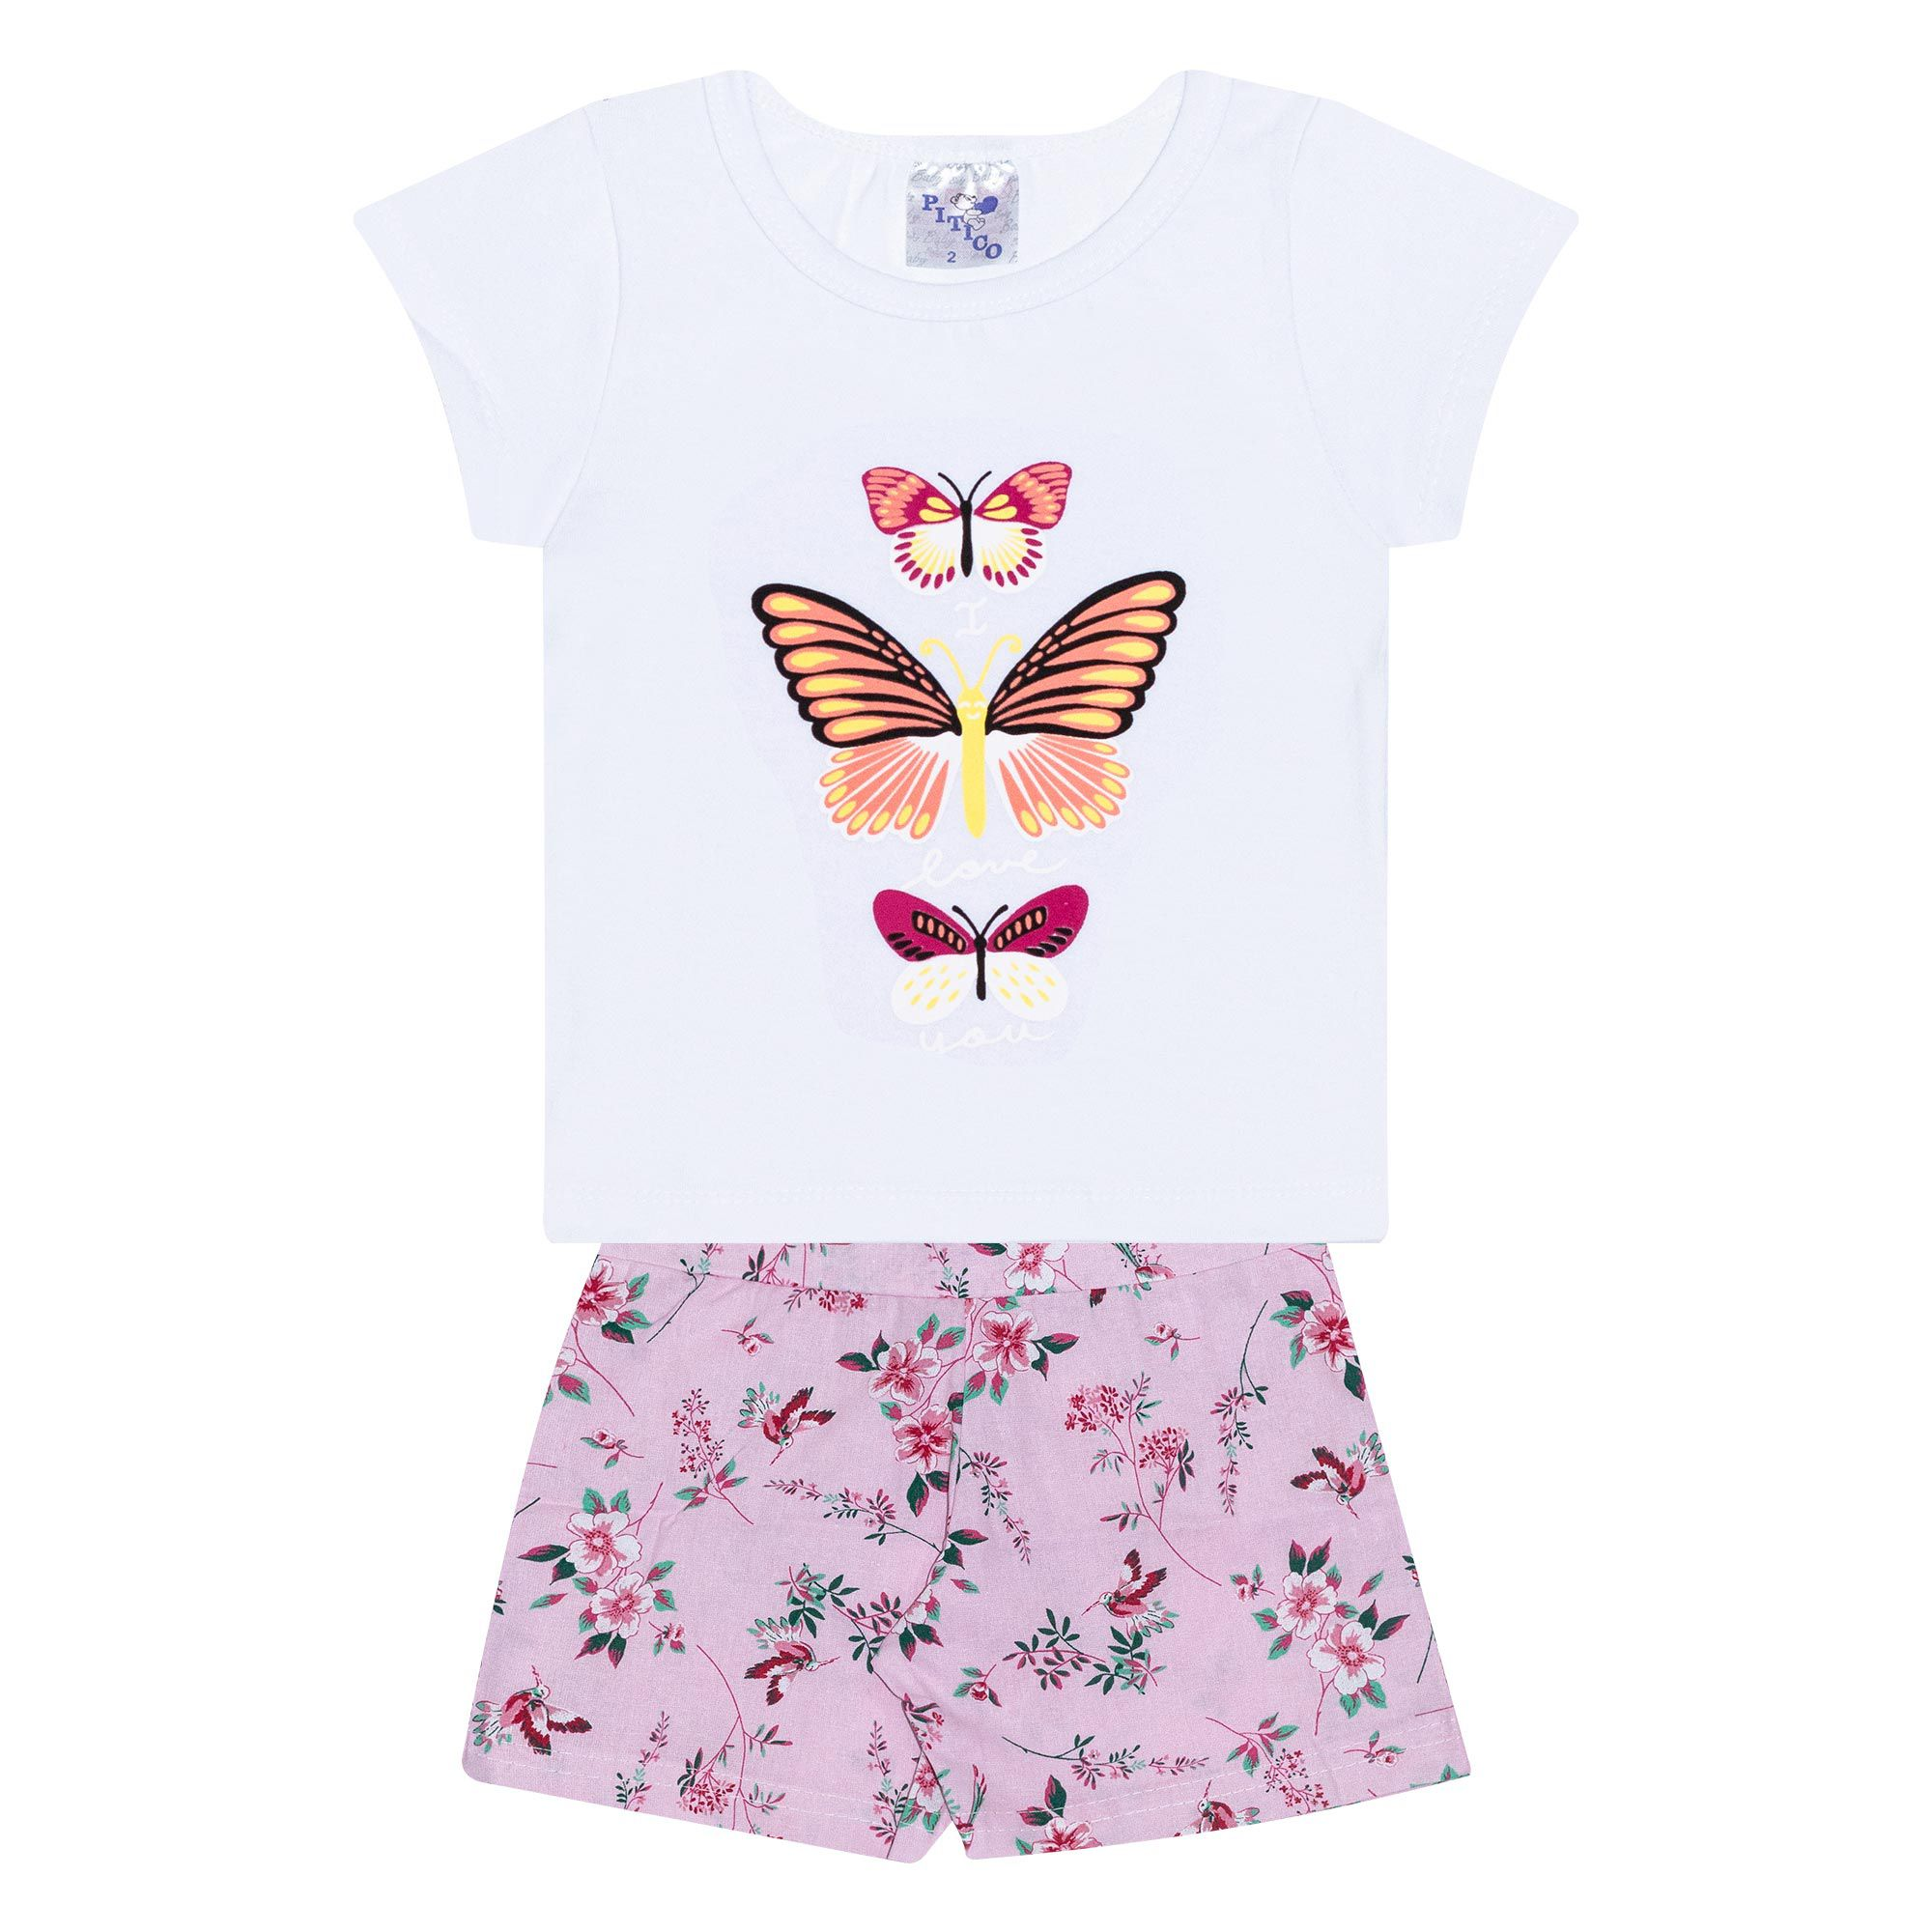 Conjunto Infantil Feminino - Ref 1037 - Branco/Rosa - Pitico